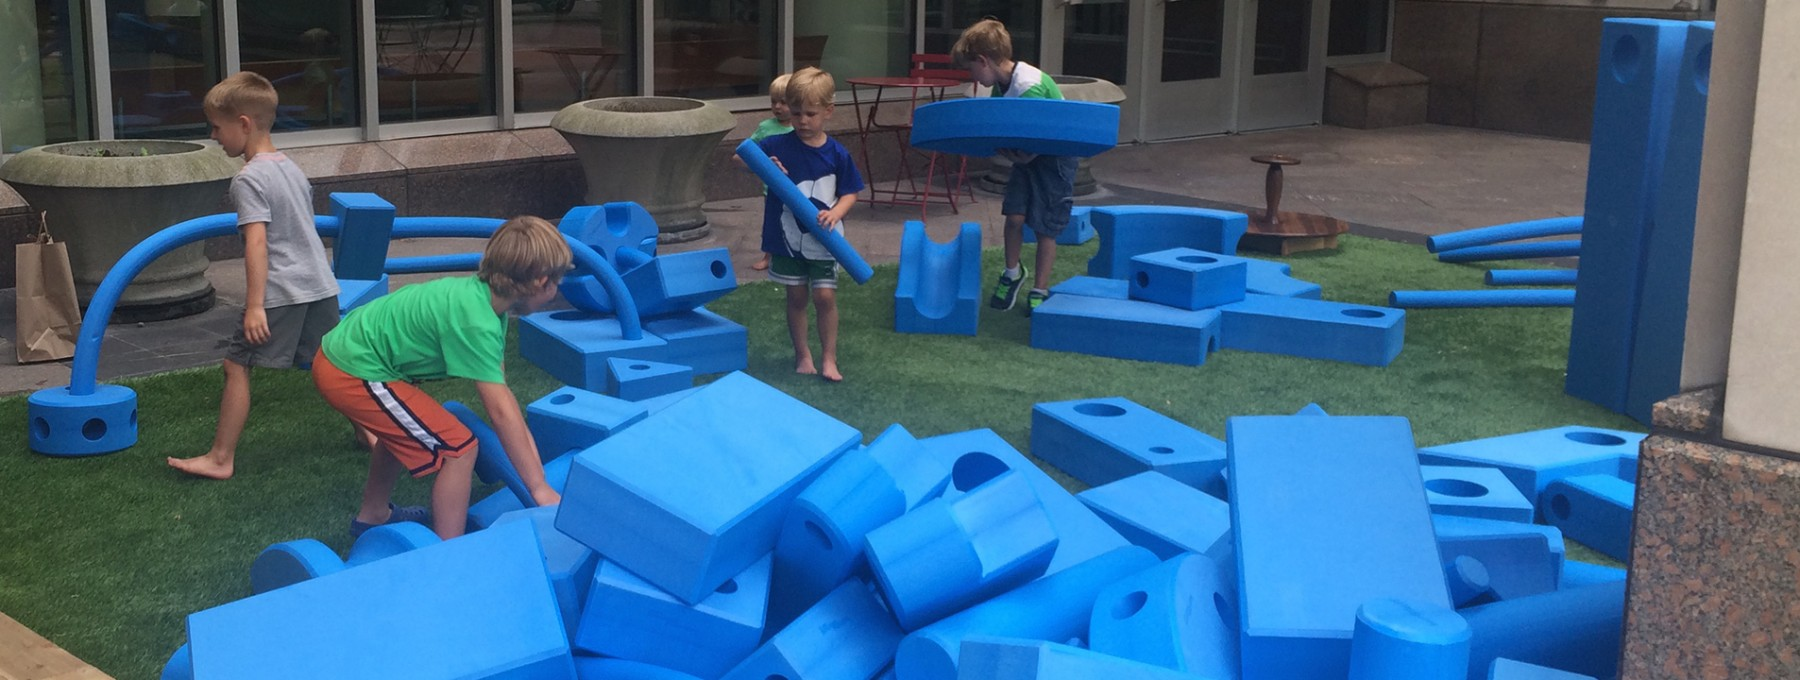 slider 9-blue blocks